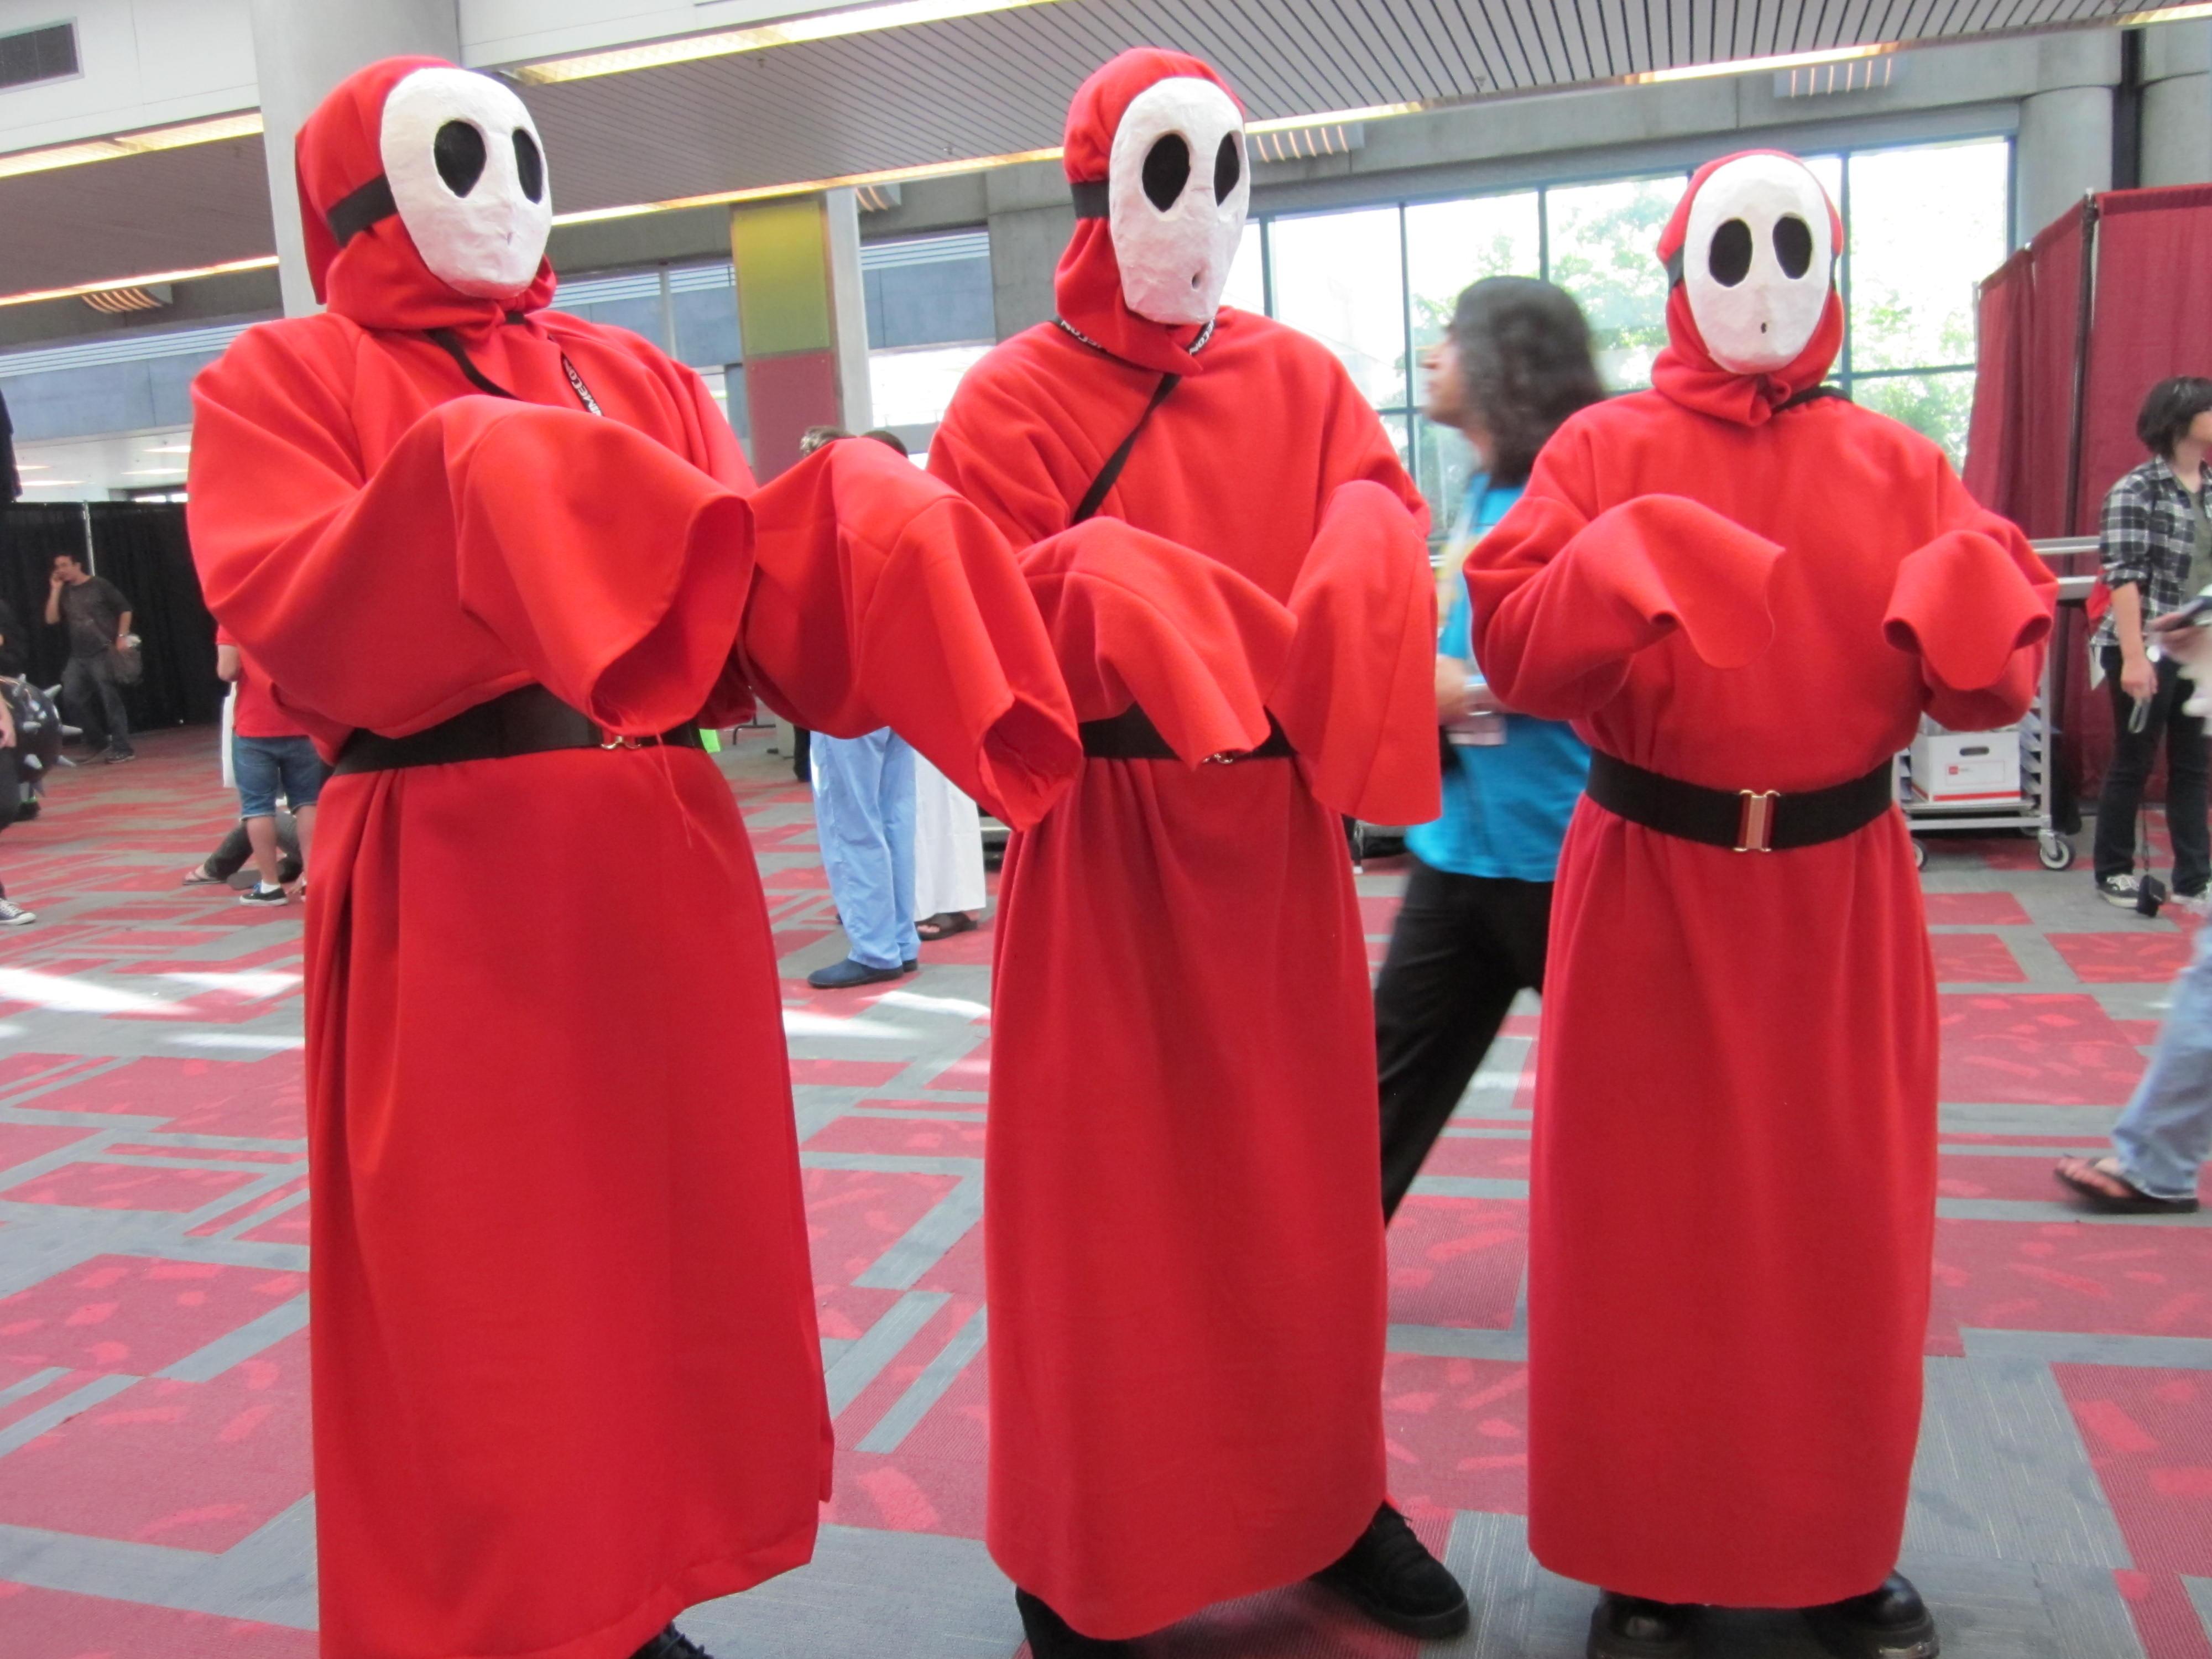 File:Shy Guy cosplayers at FanimeCon 2010-05-30 1.JPG - Wikimedia Commons